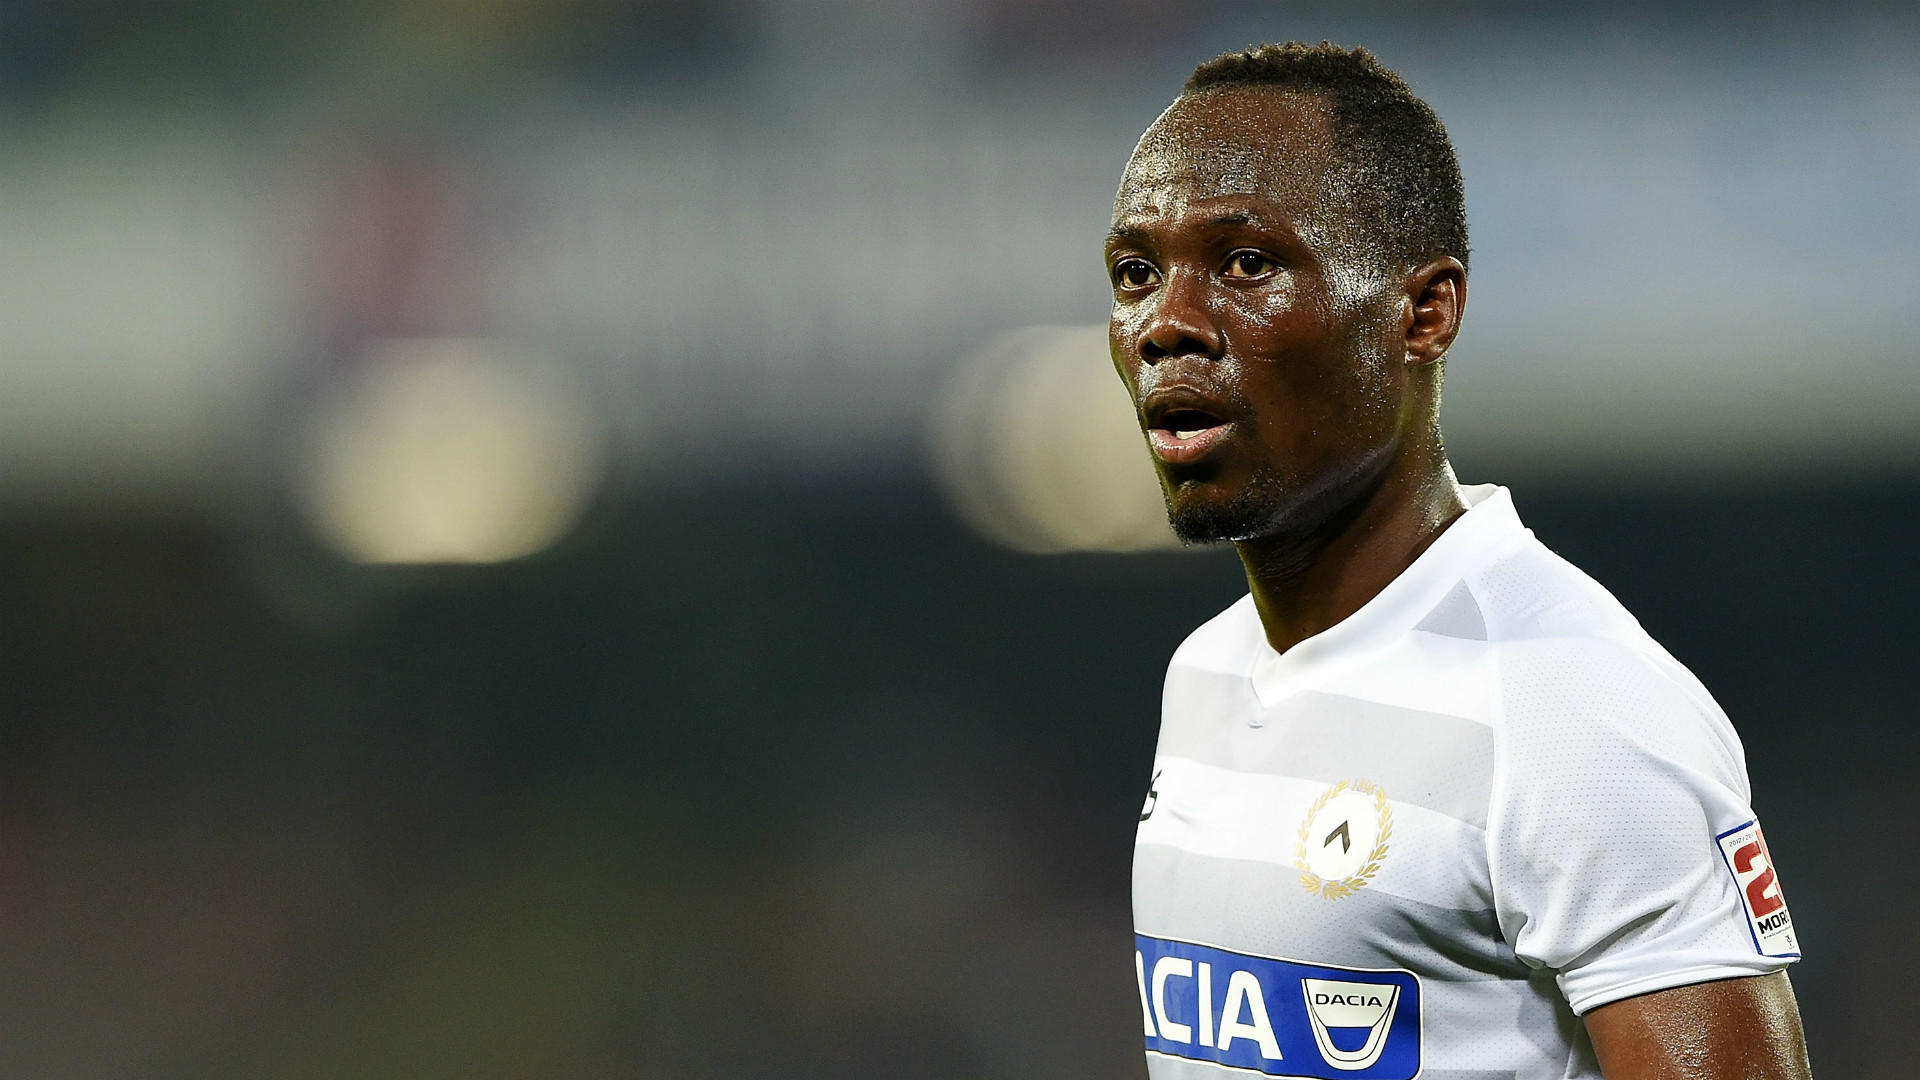 Badu saluta l'Udinese, destinazione Bursaspor